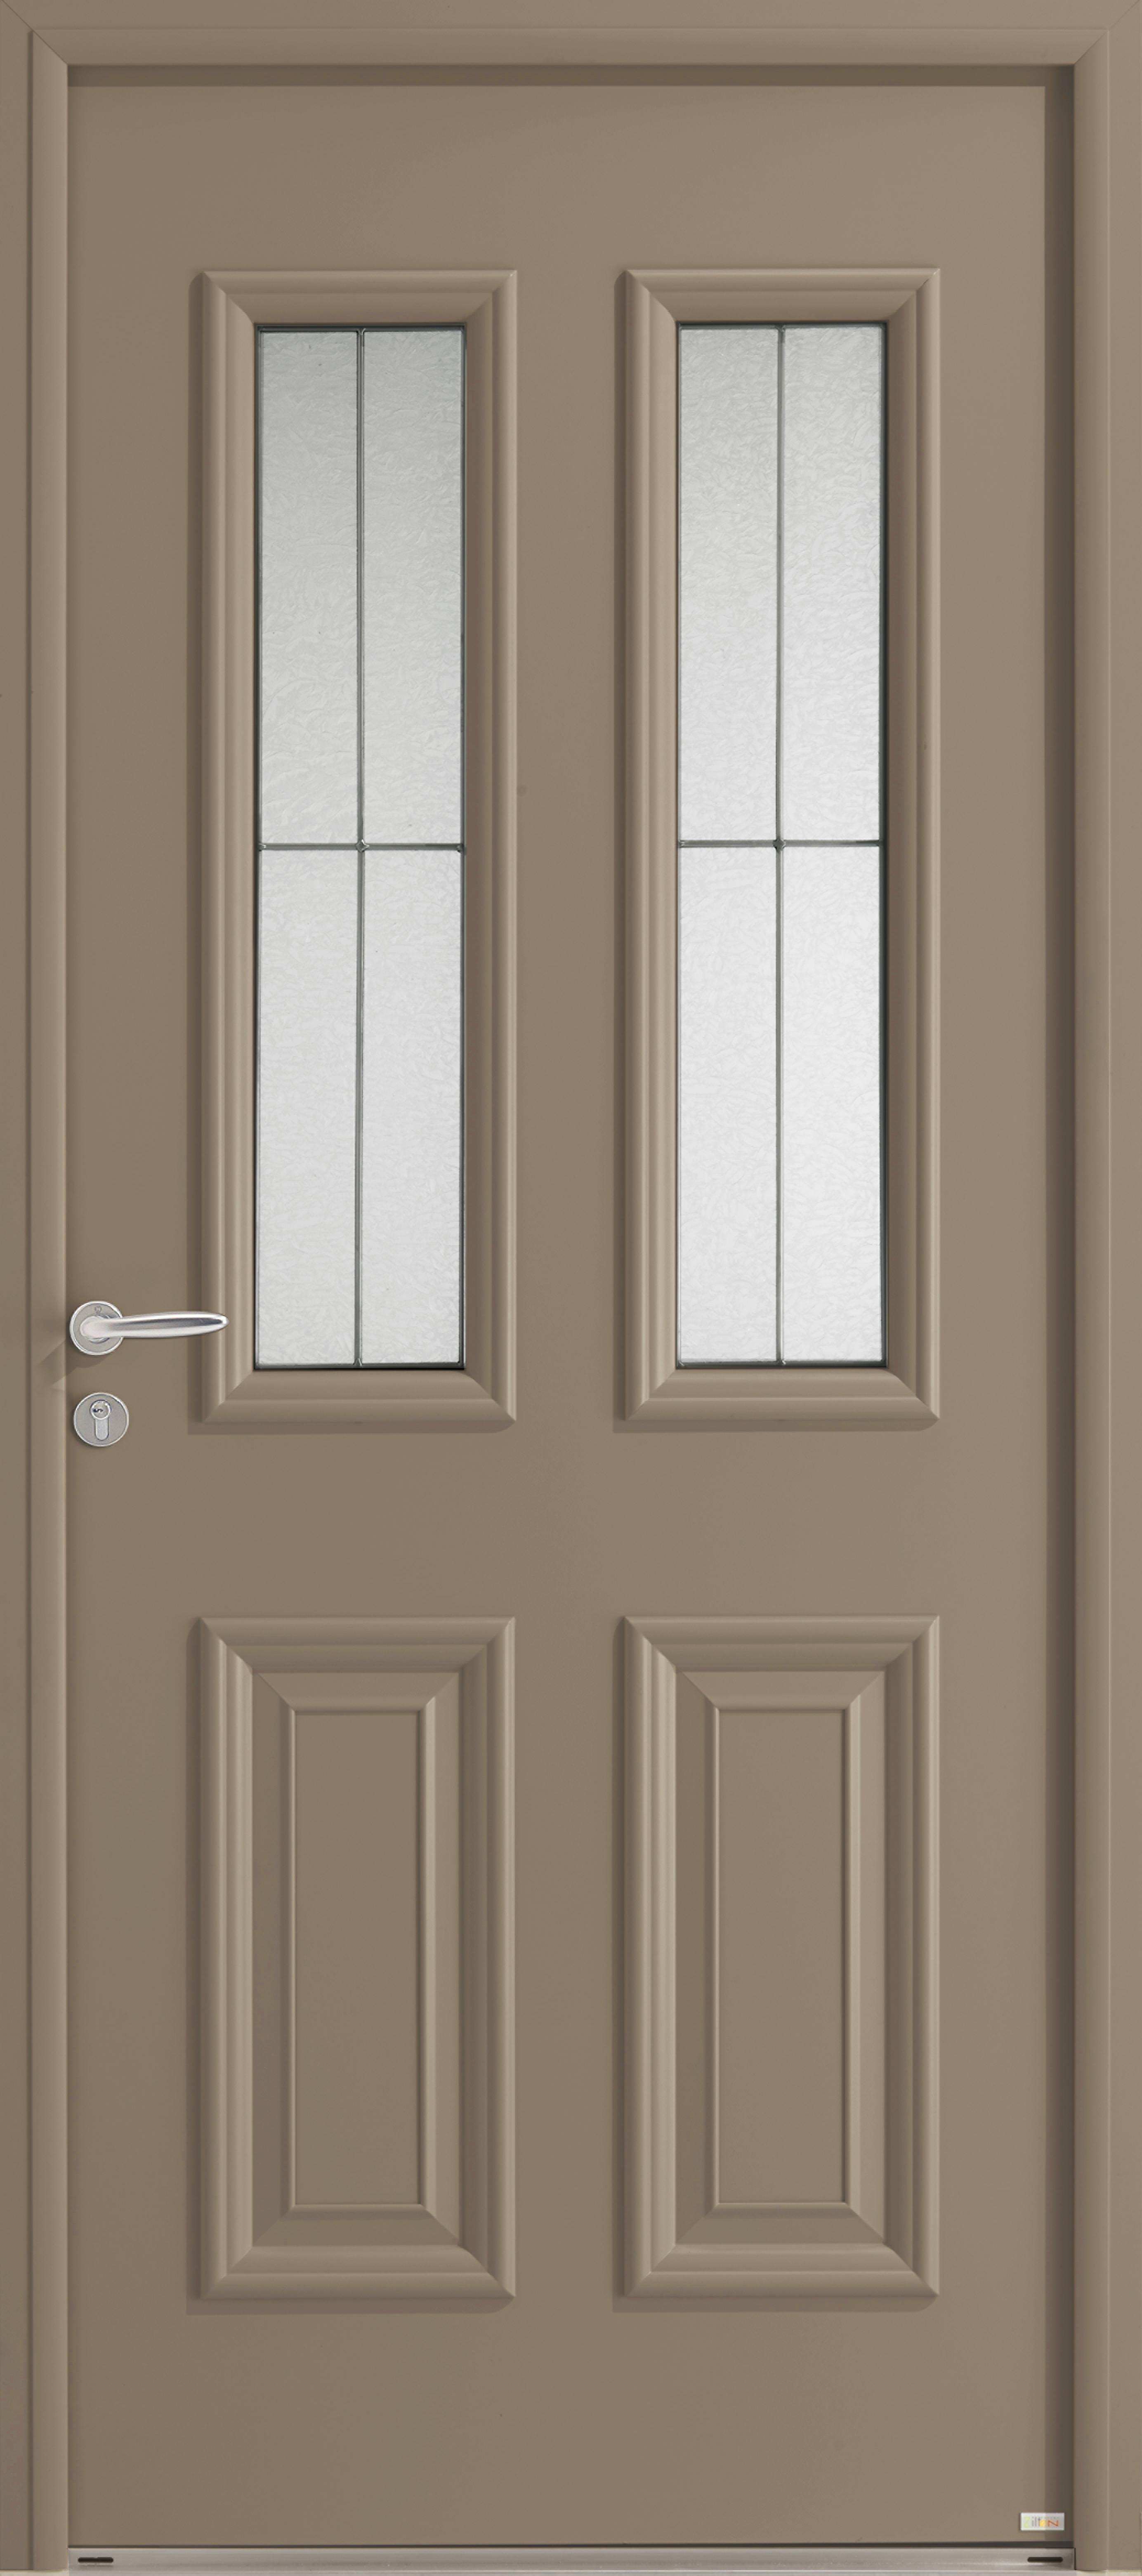 Porte d'entrée Celesta Duo